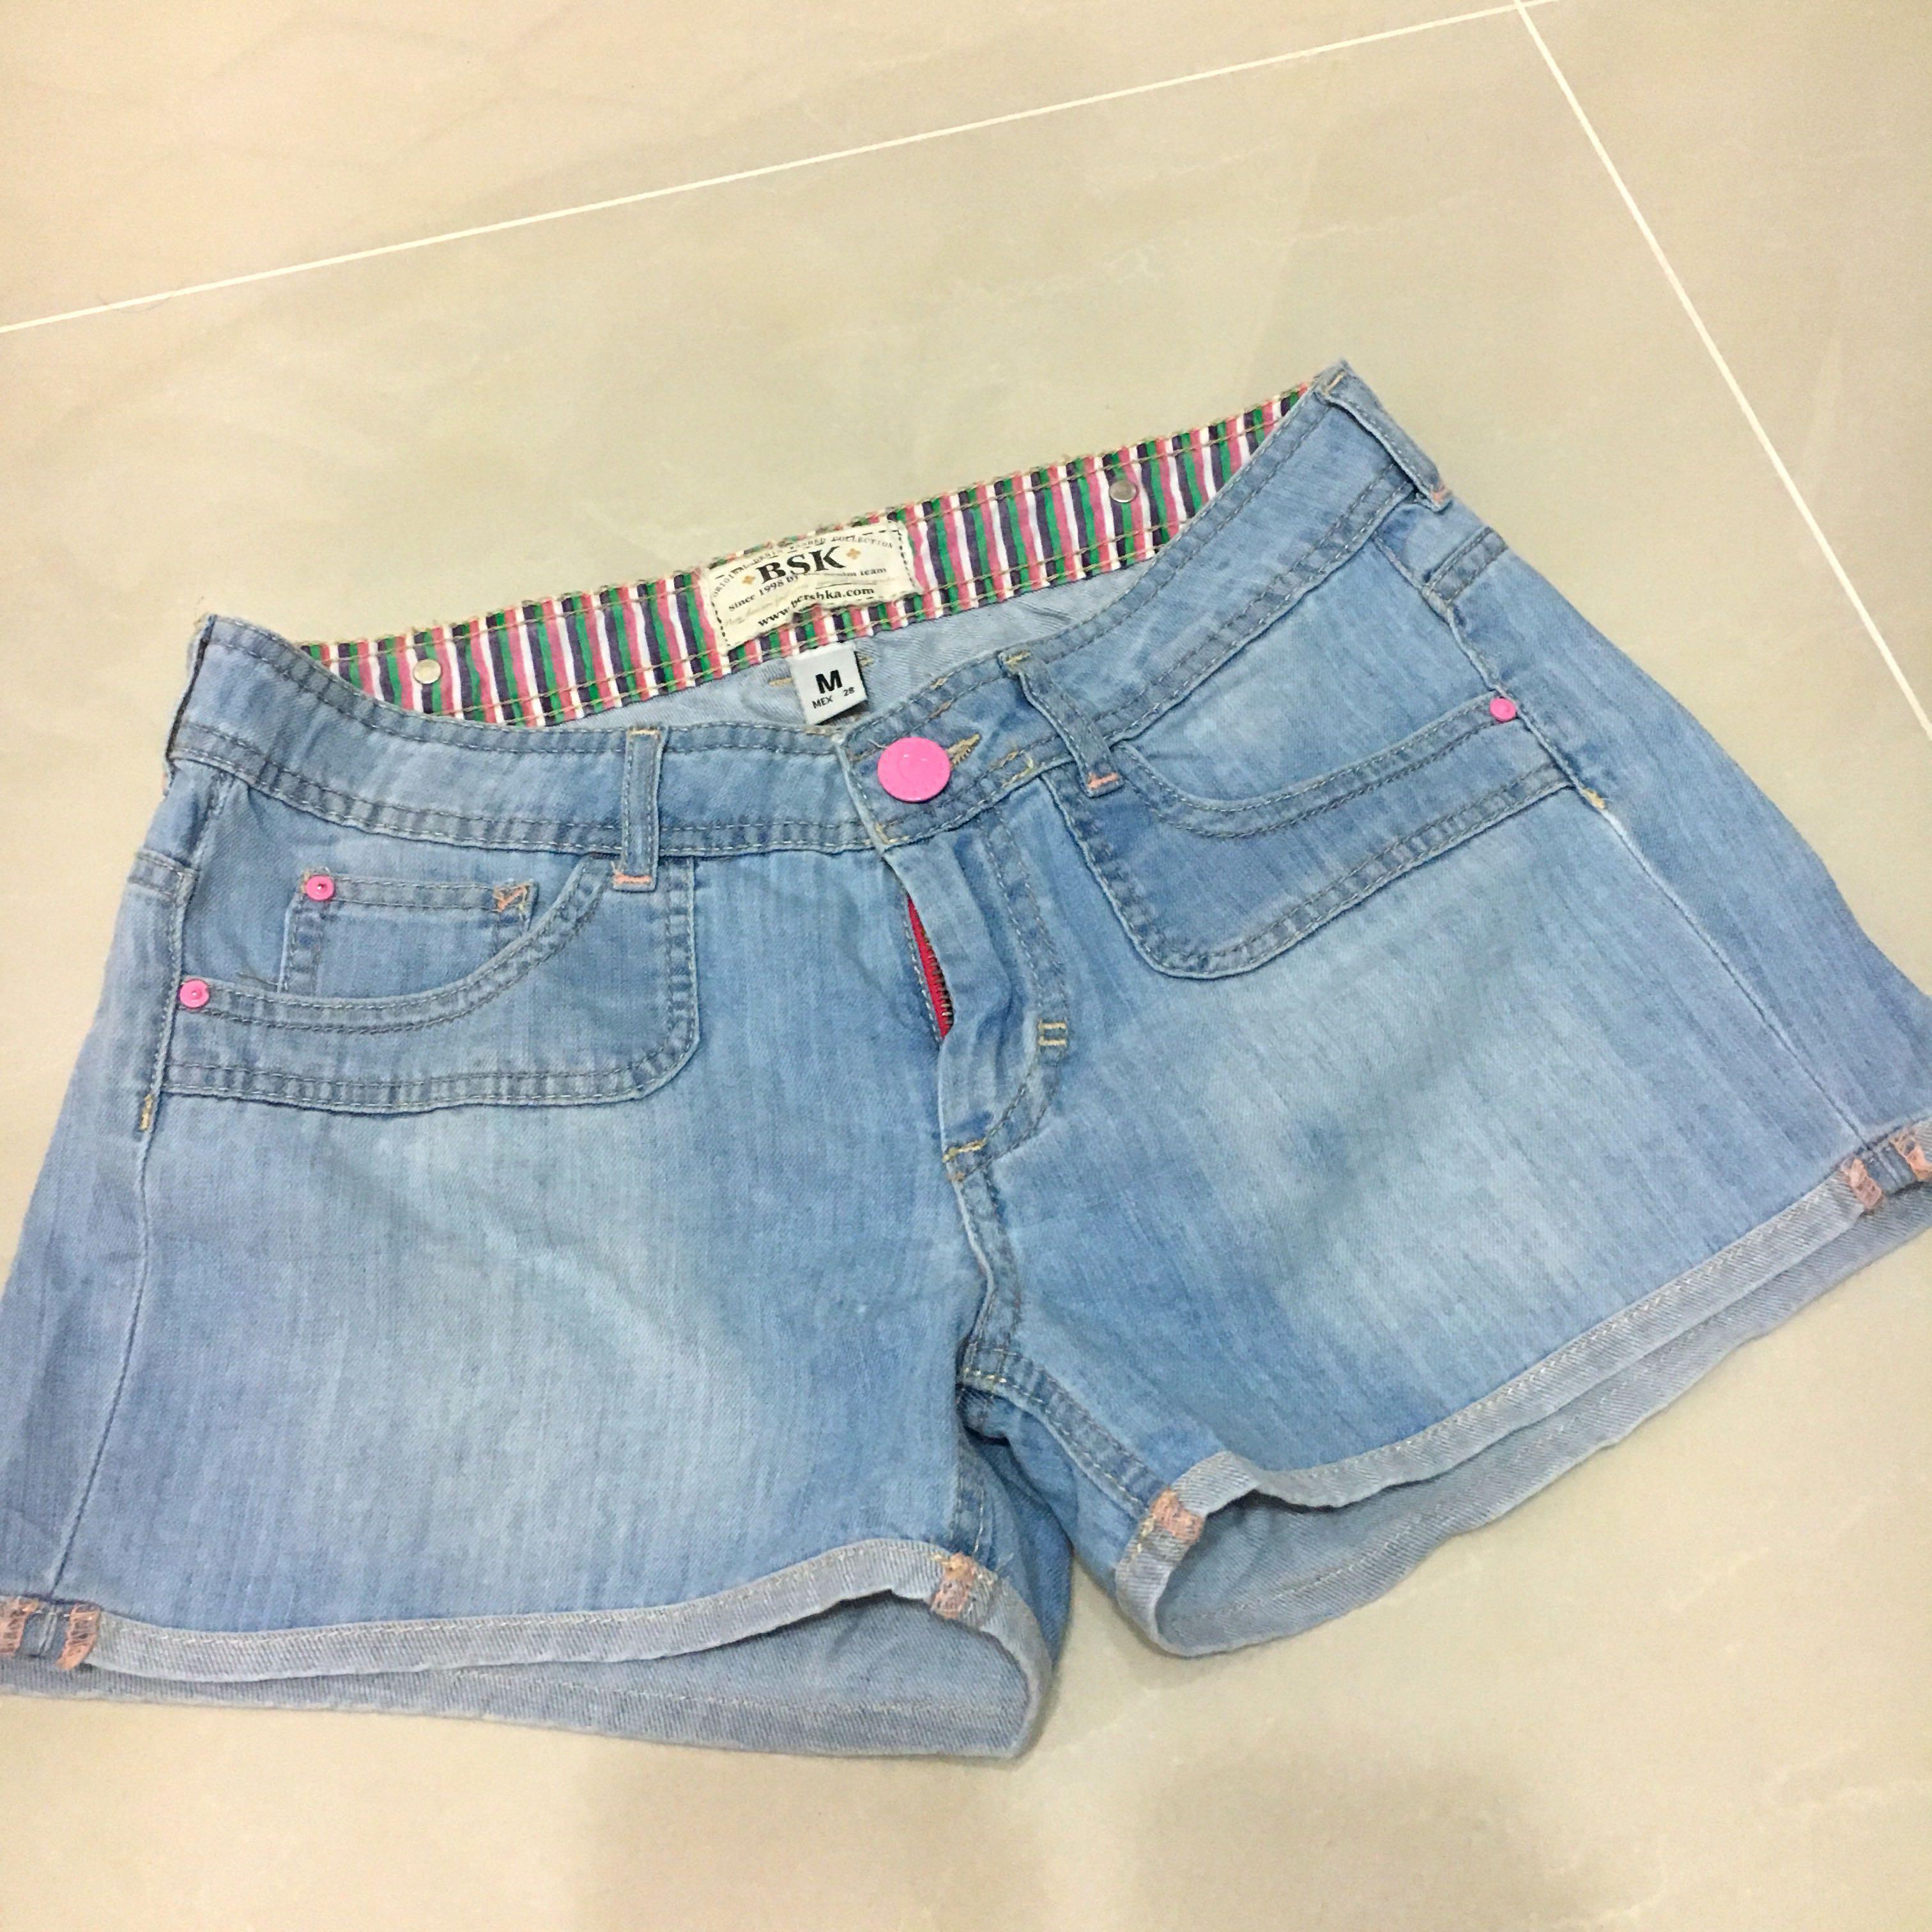 a6558bce48 BERSHKA Denim Shorts (FREE NM), Women's Fashion, Clothes, Pants ...